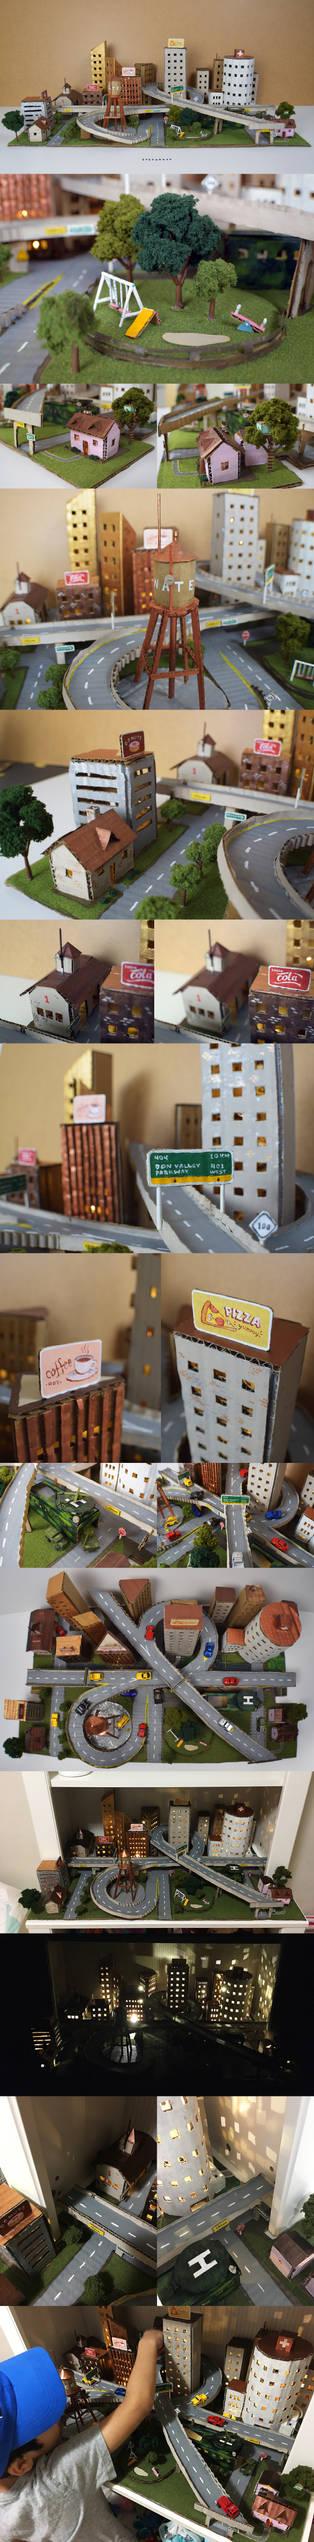 Cardboard play city